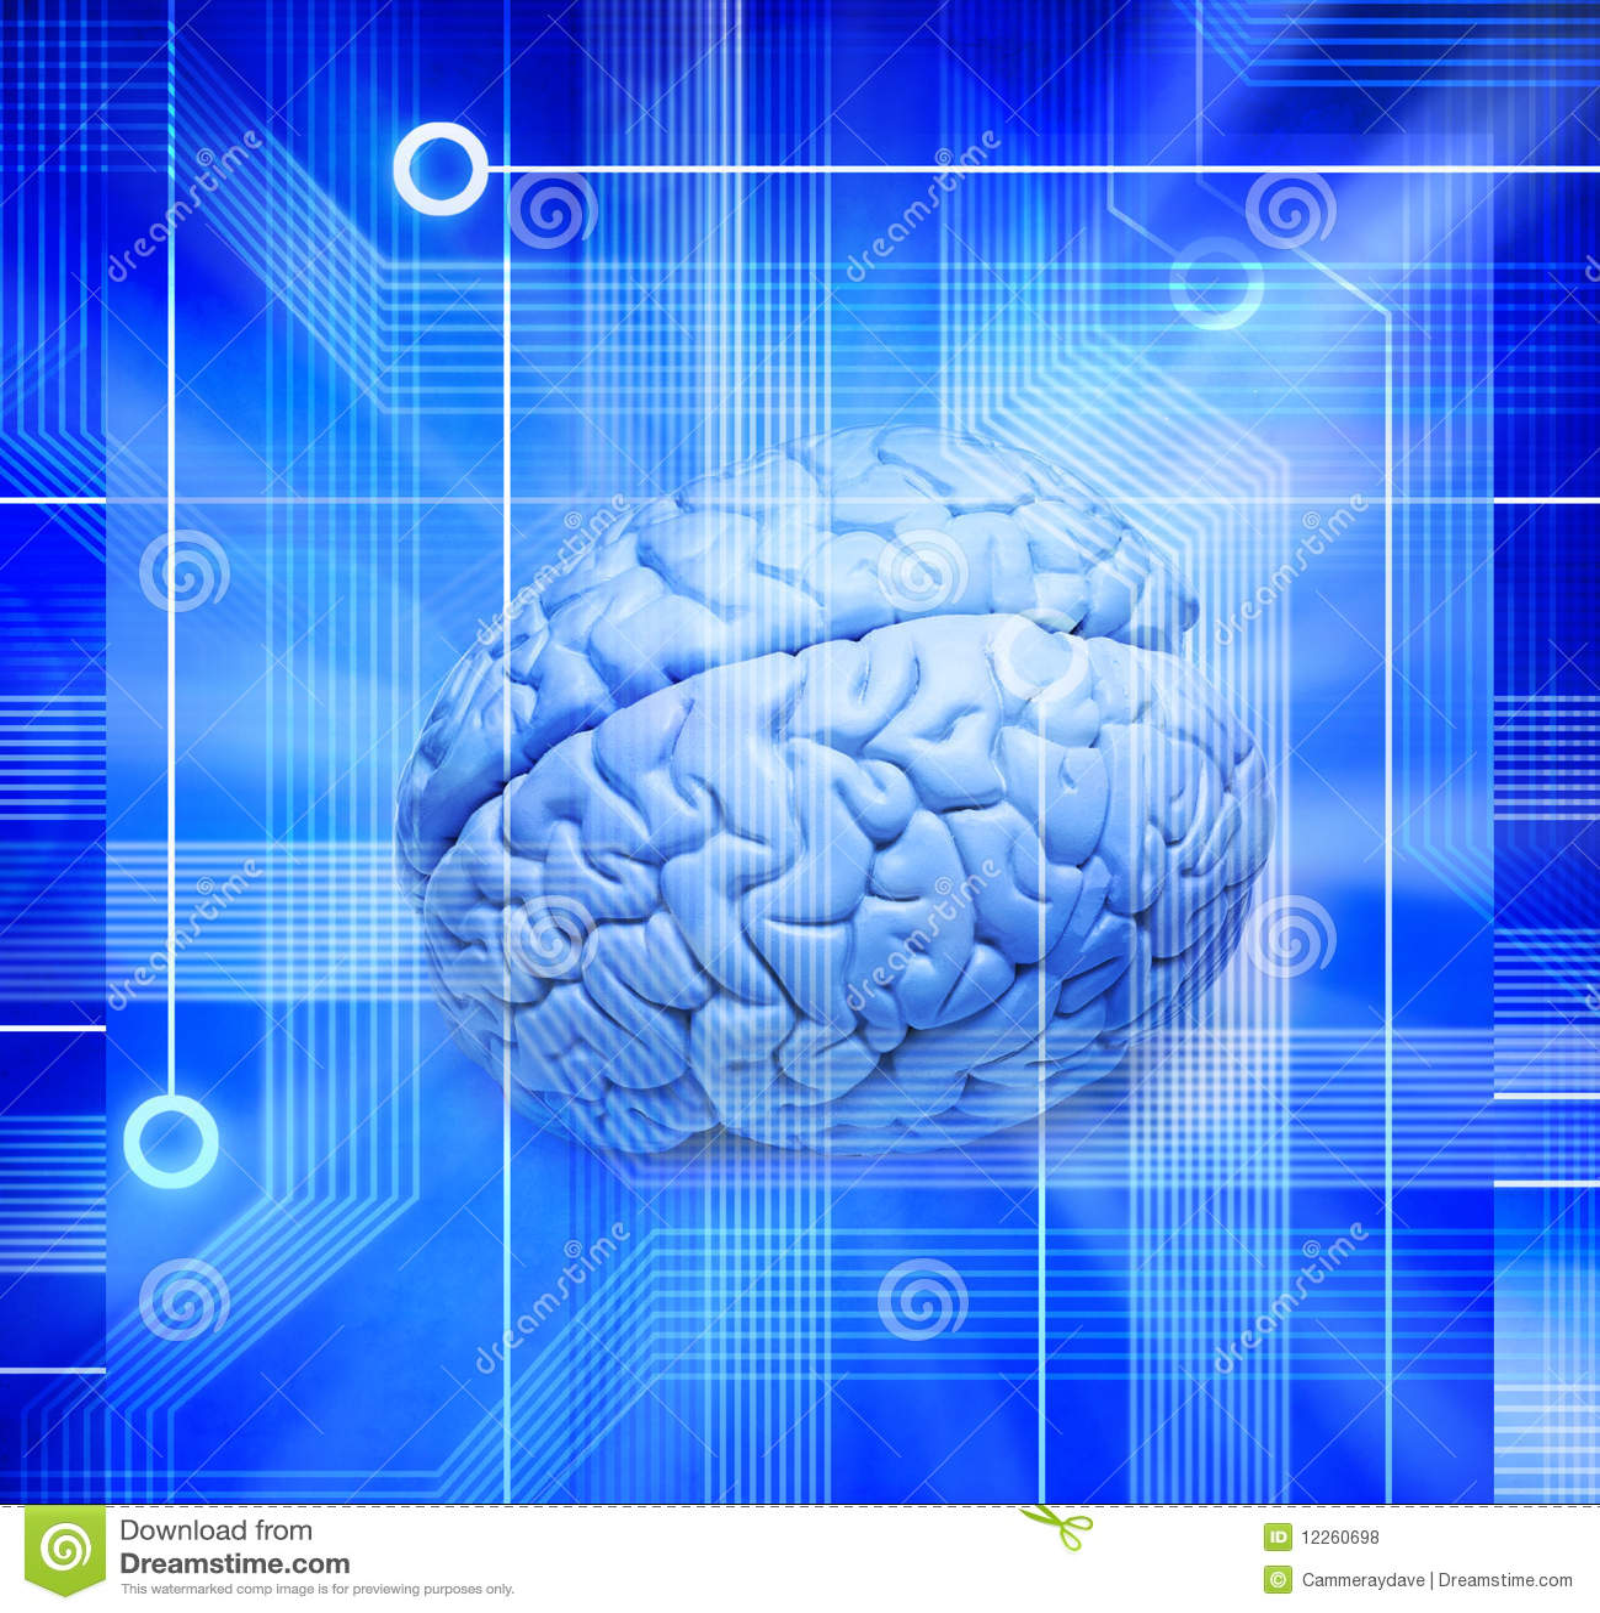 Computer Intelligence Brain Technology Chip Science